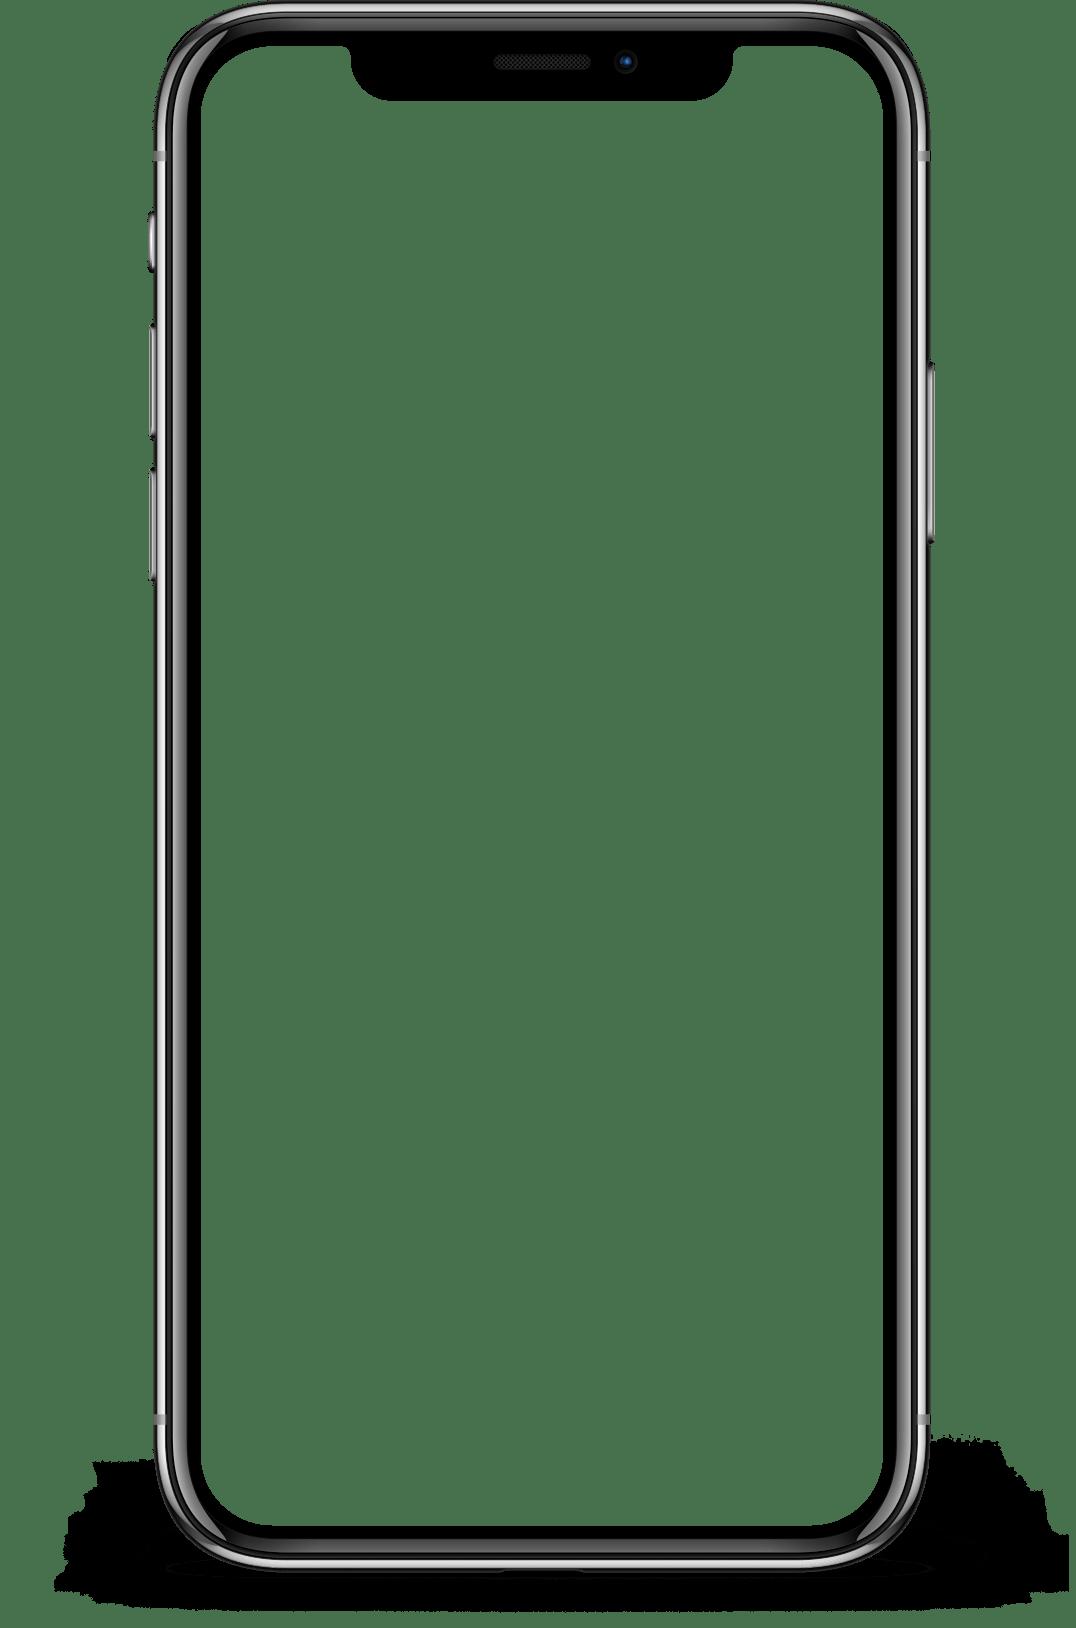 mobile image